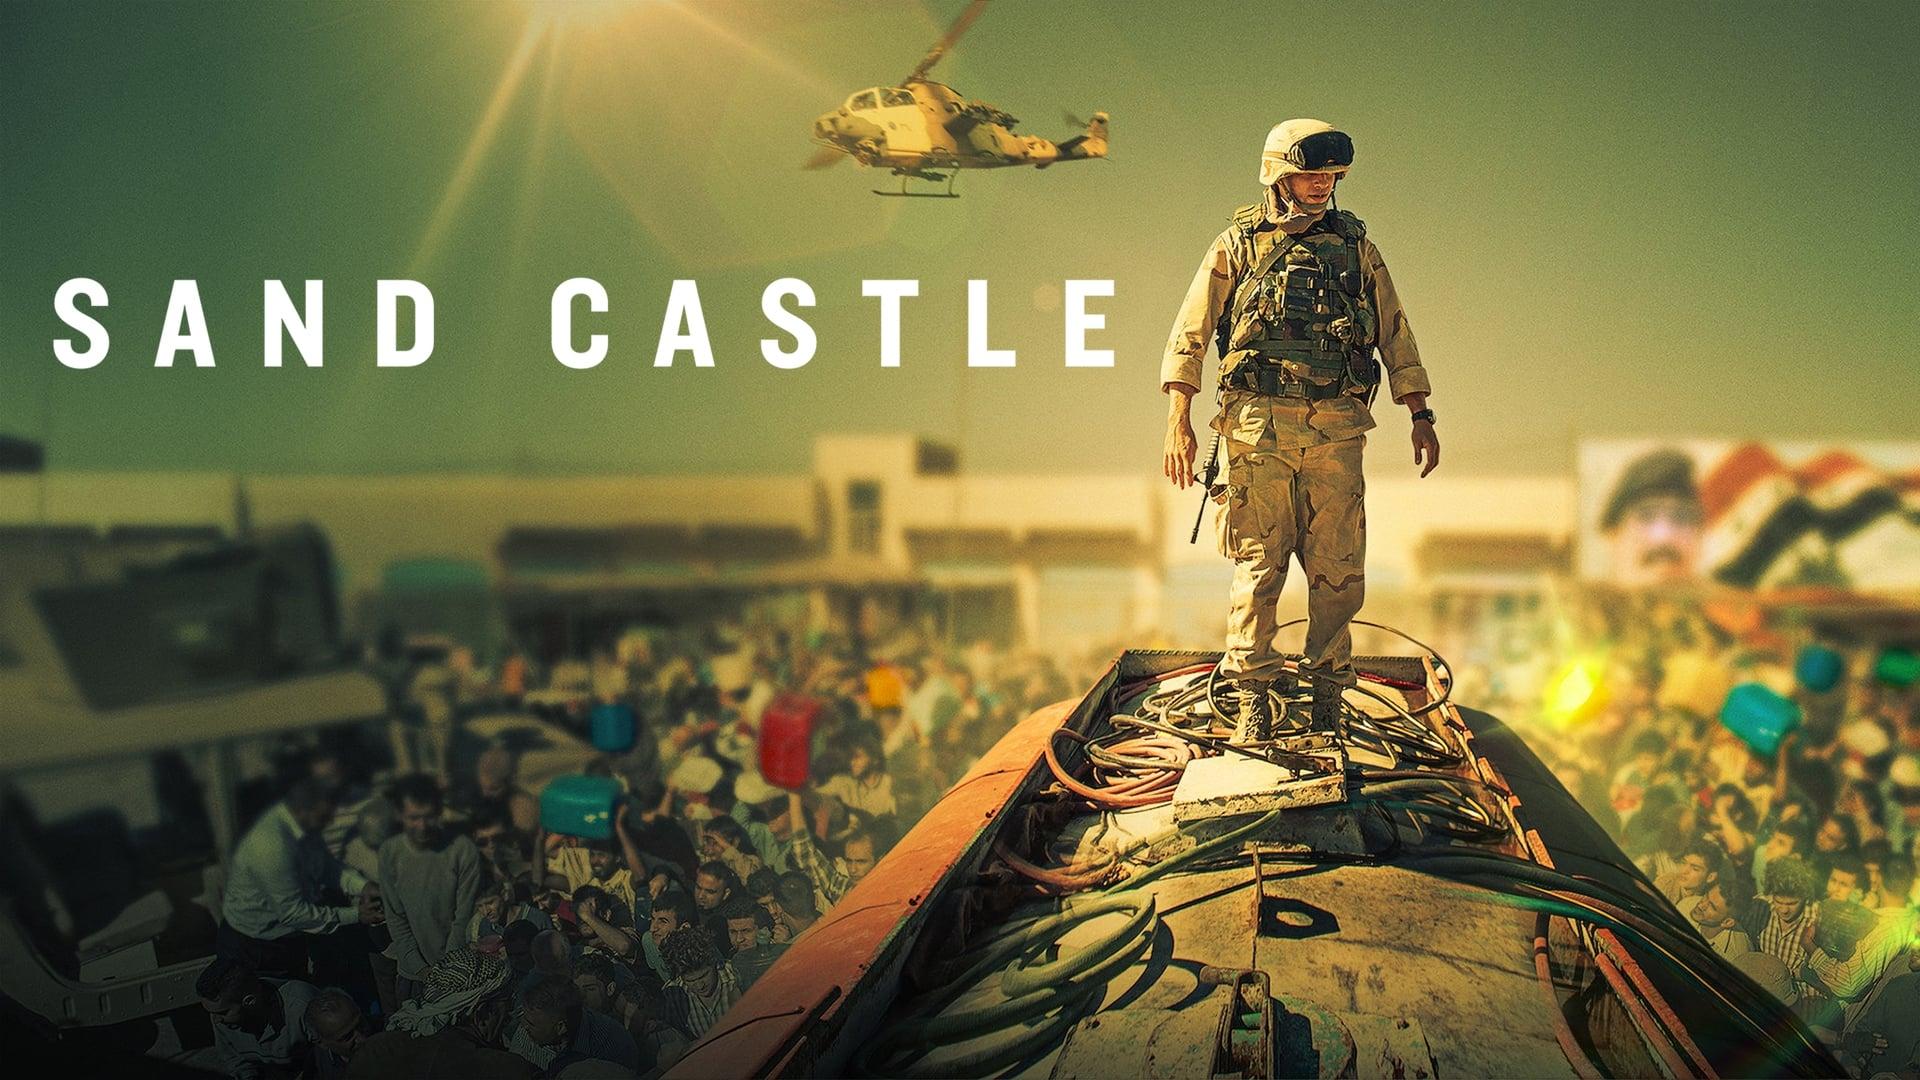 Sand Castle Movie